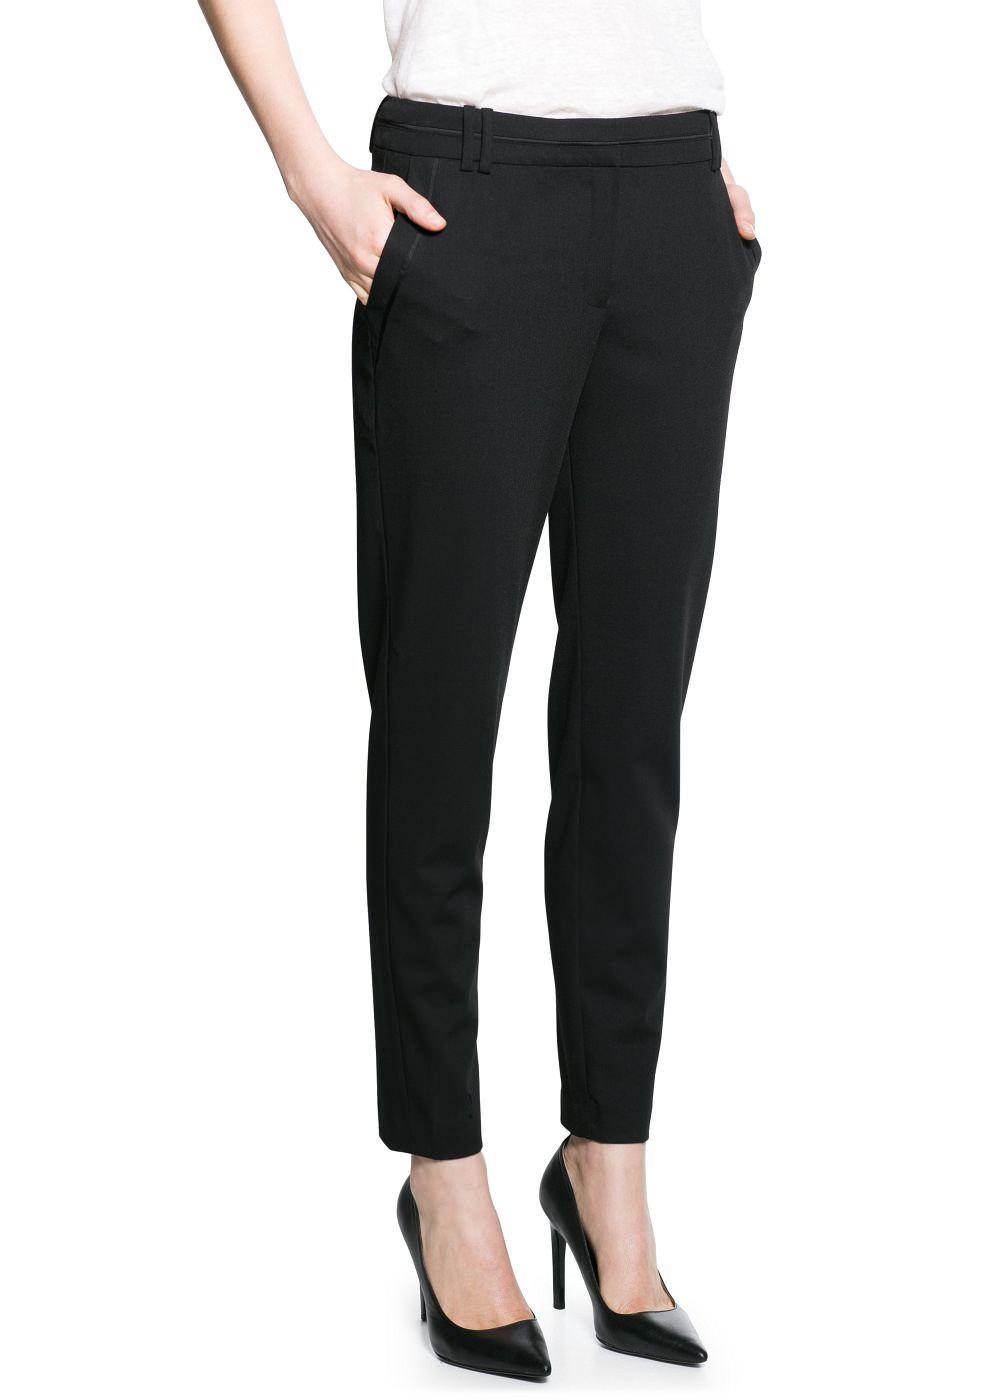 0f36897084 Pantalón traje pitillo - Mujer